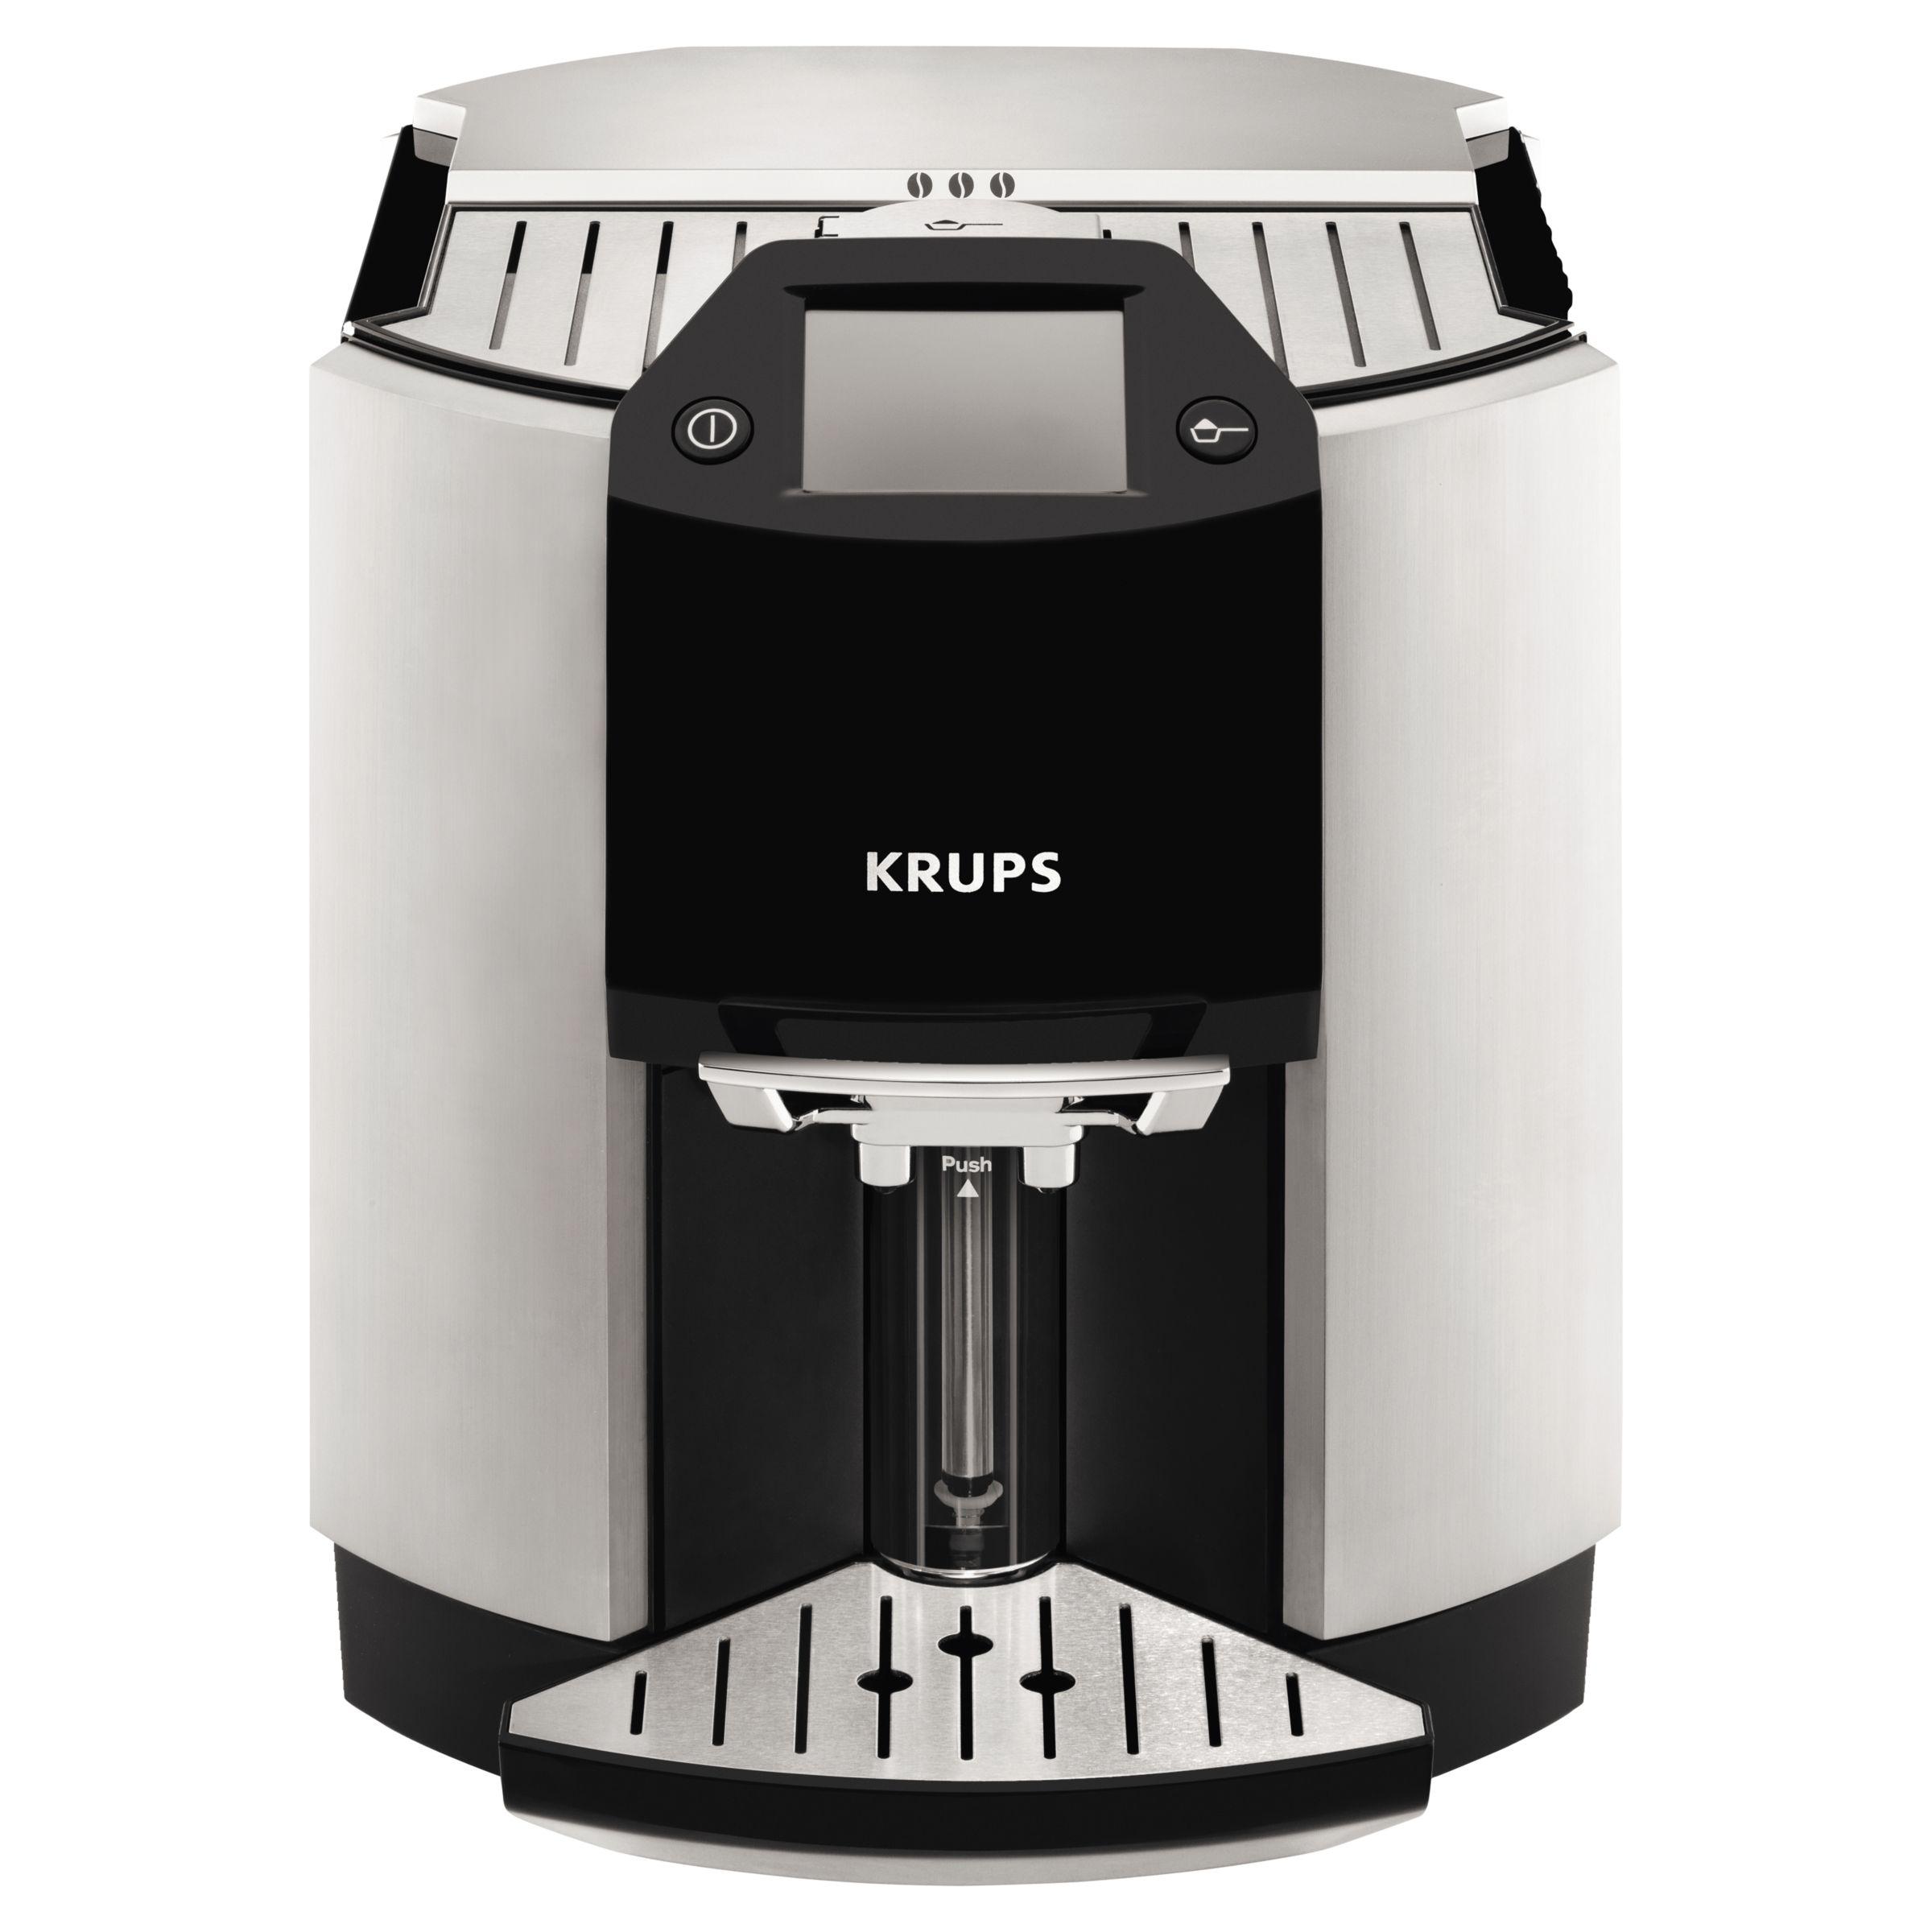 Krups KRUPS EA9010 Espresseria Bean-to-Cup Coffee Machine, Silver